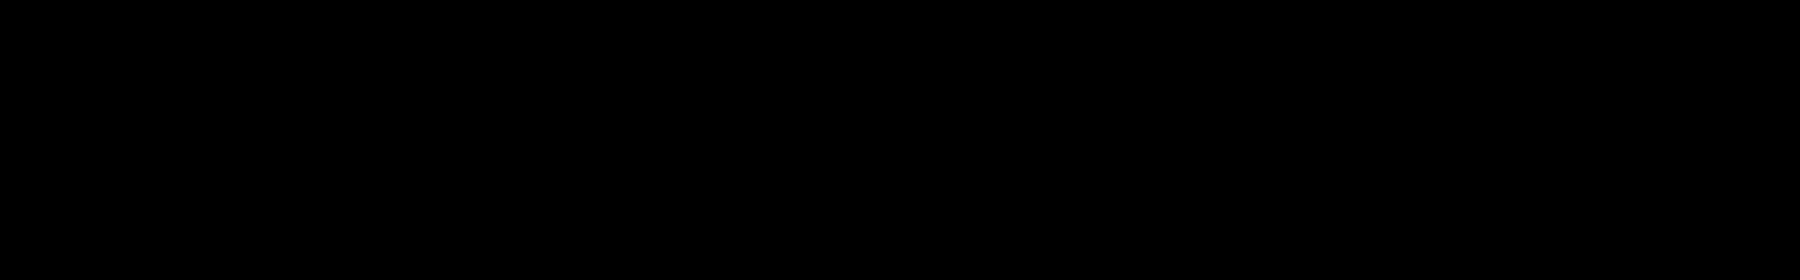 Modular Cinematics audio waveform